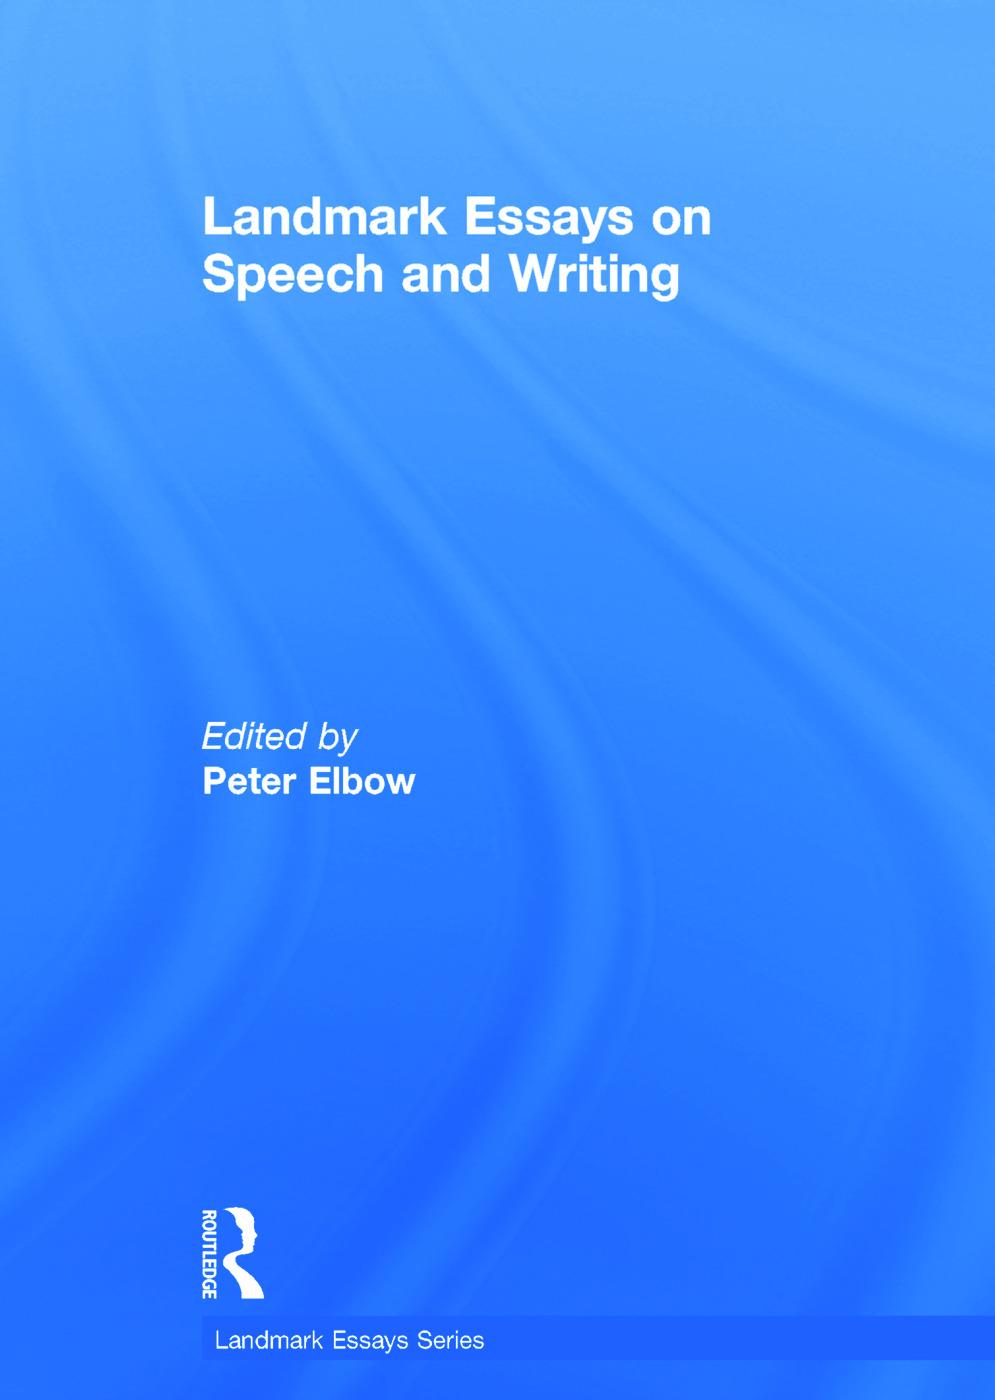 Landmark Essays on Speech and Writing book cover